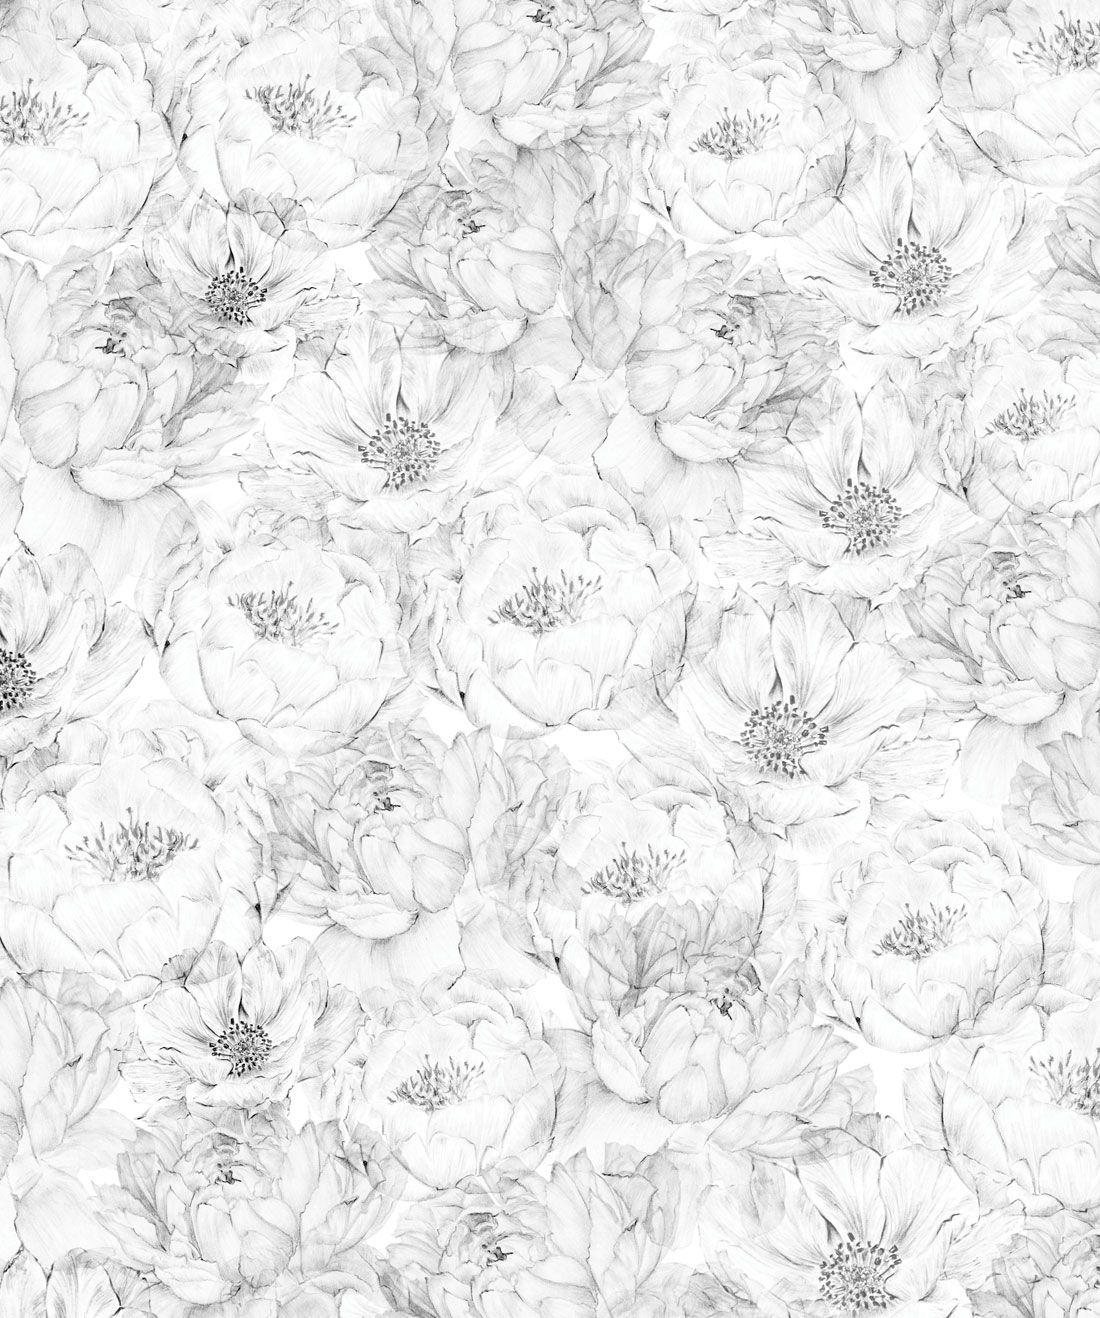 Peonies & Anemones (Large) Wallpaper (Two Rolls)